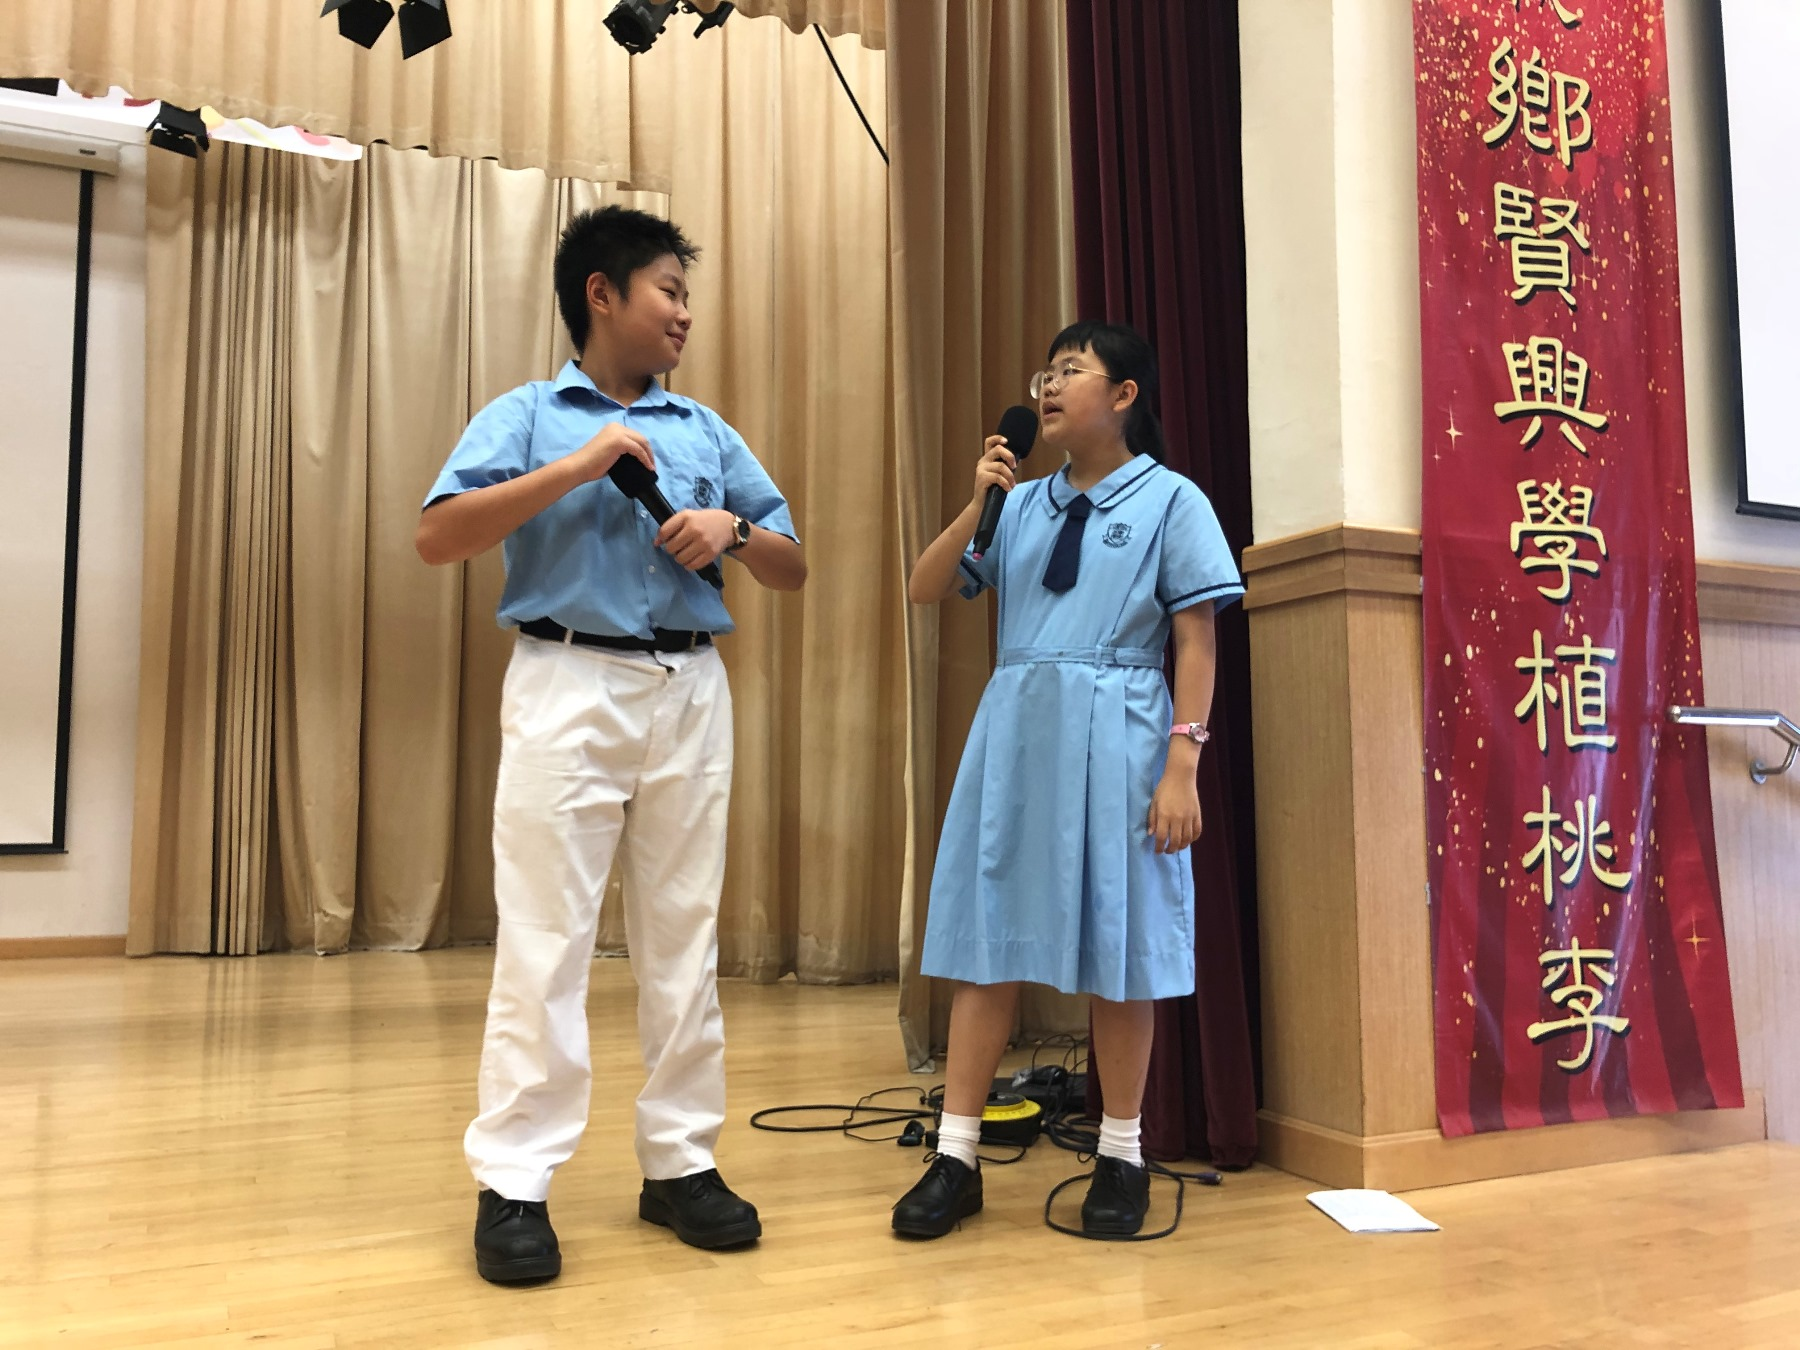 http://npc.edu.hk/sites/default/files/img_5831_2.jpg